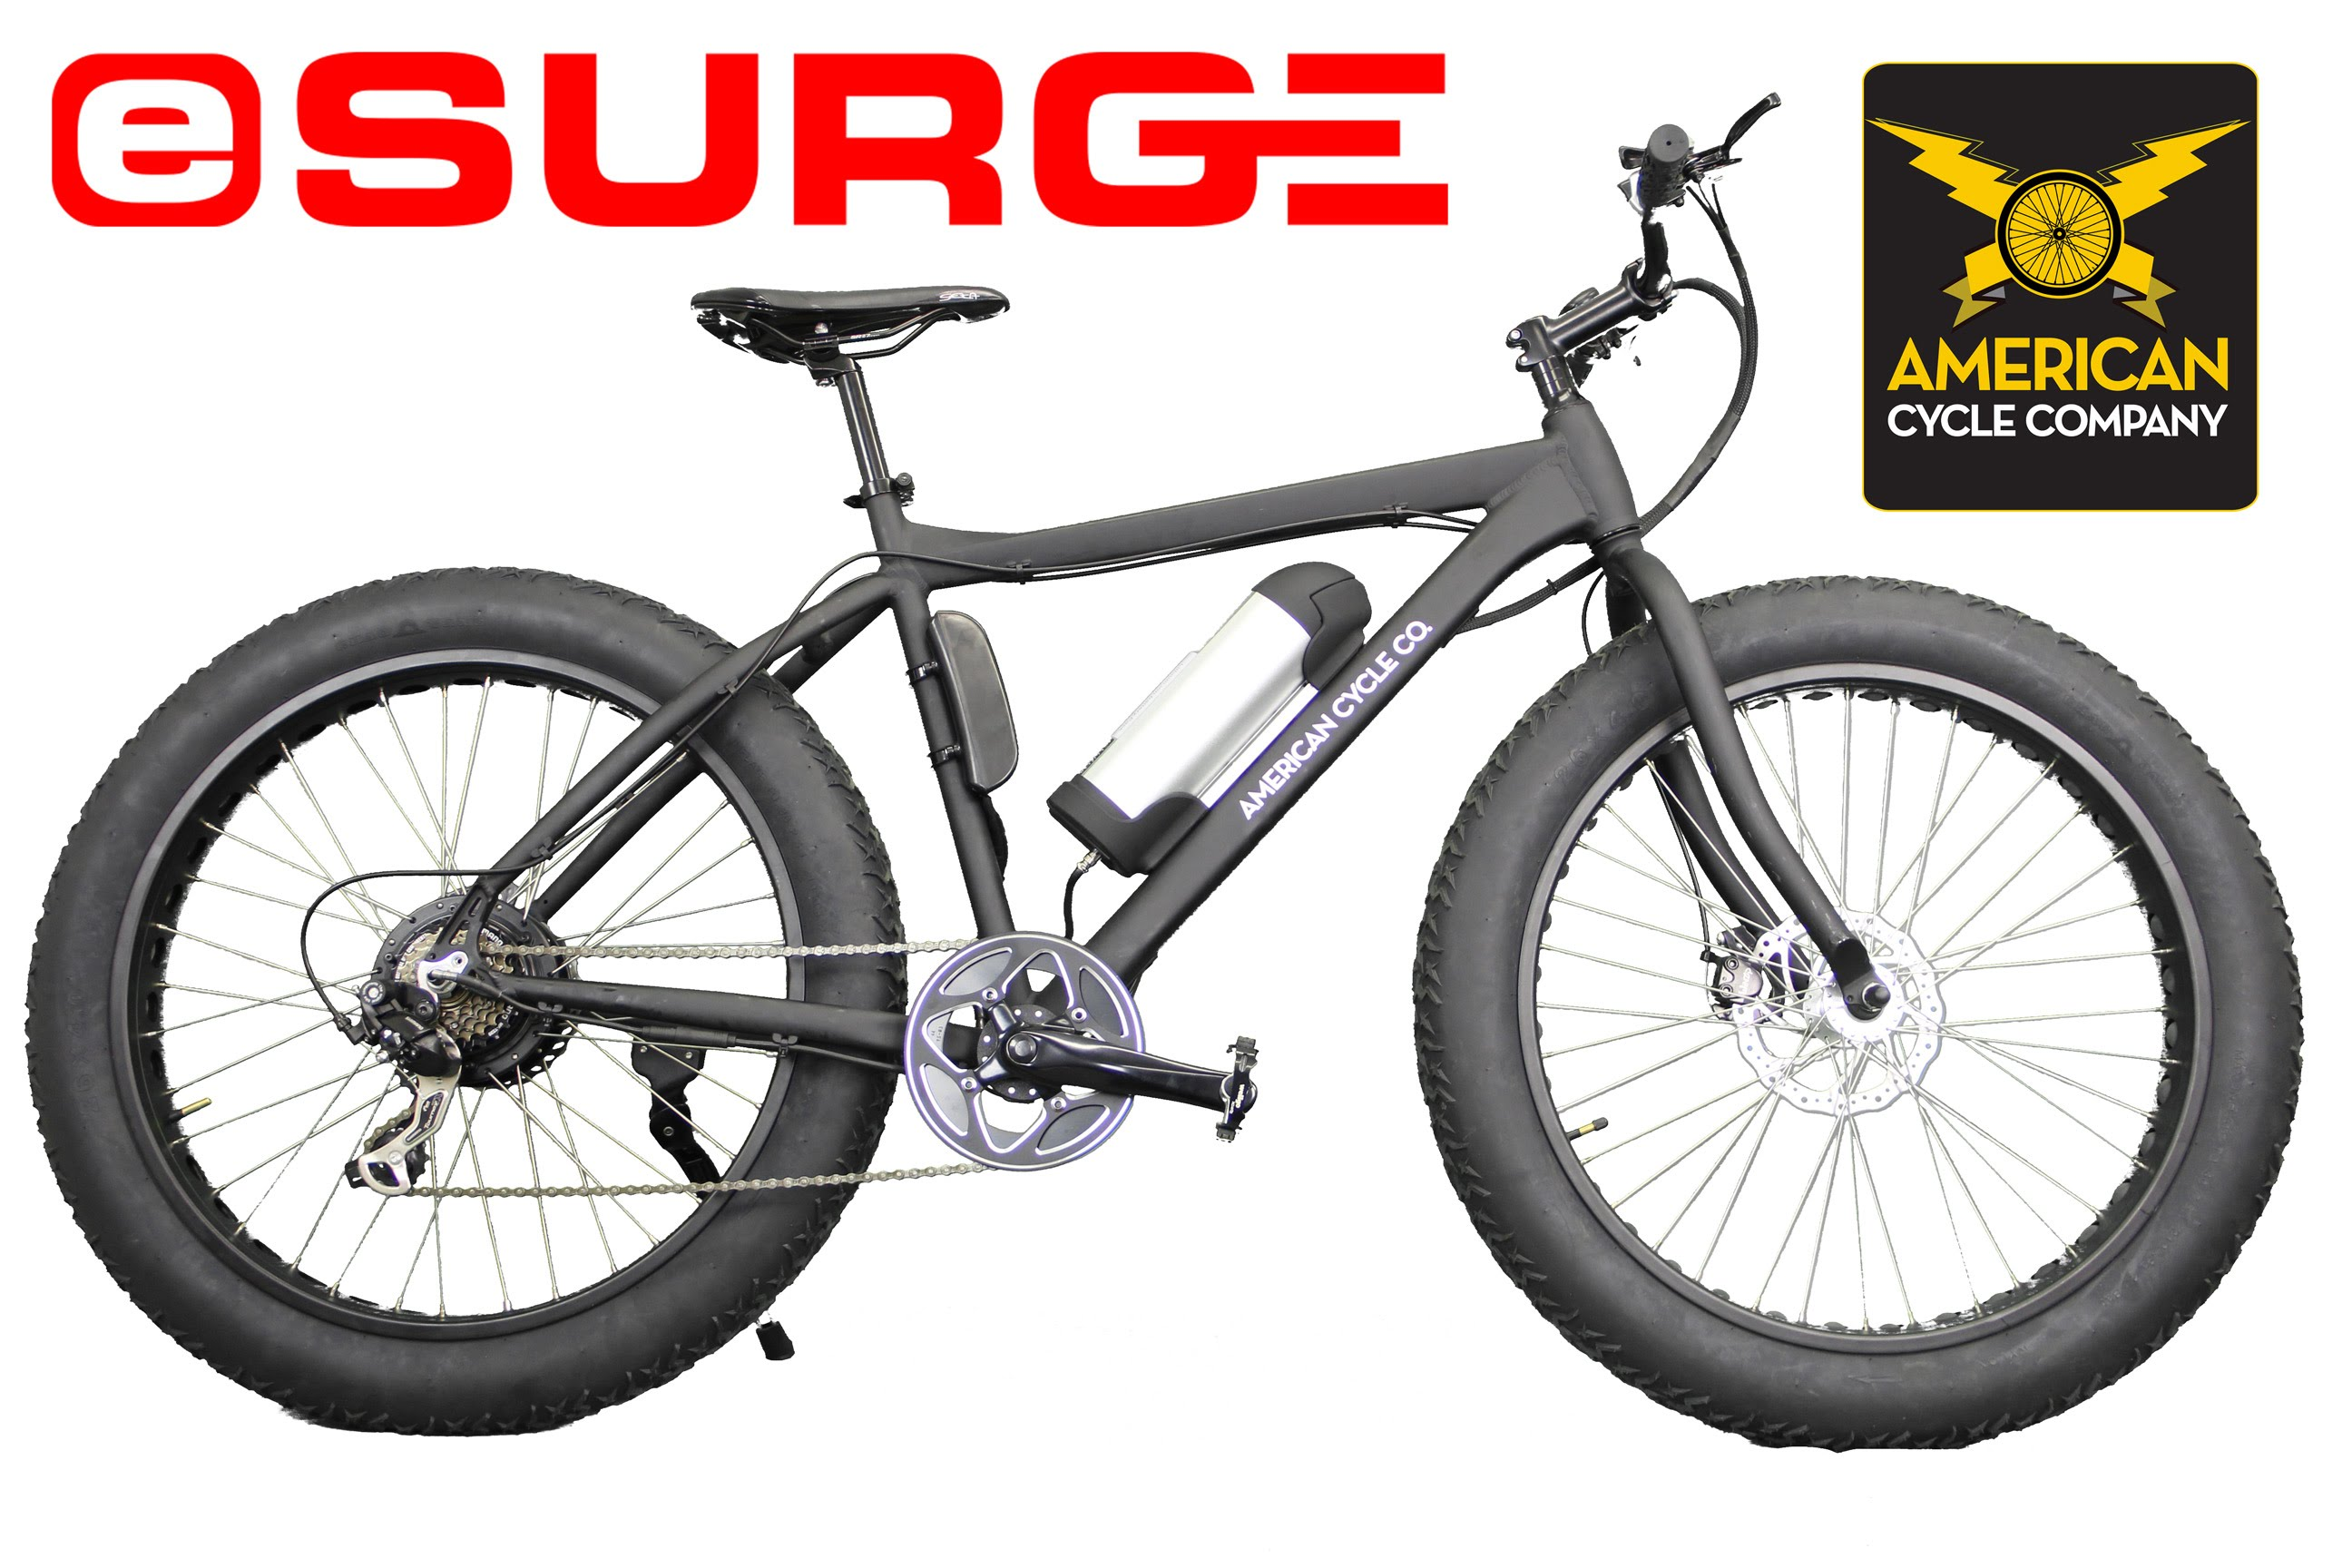 American Cycle Company Introduces ESURGE Electric Mountain Bike